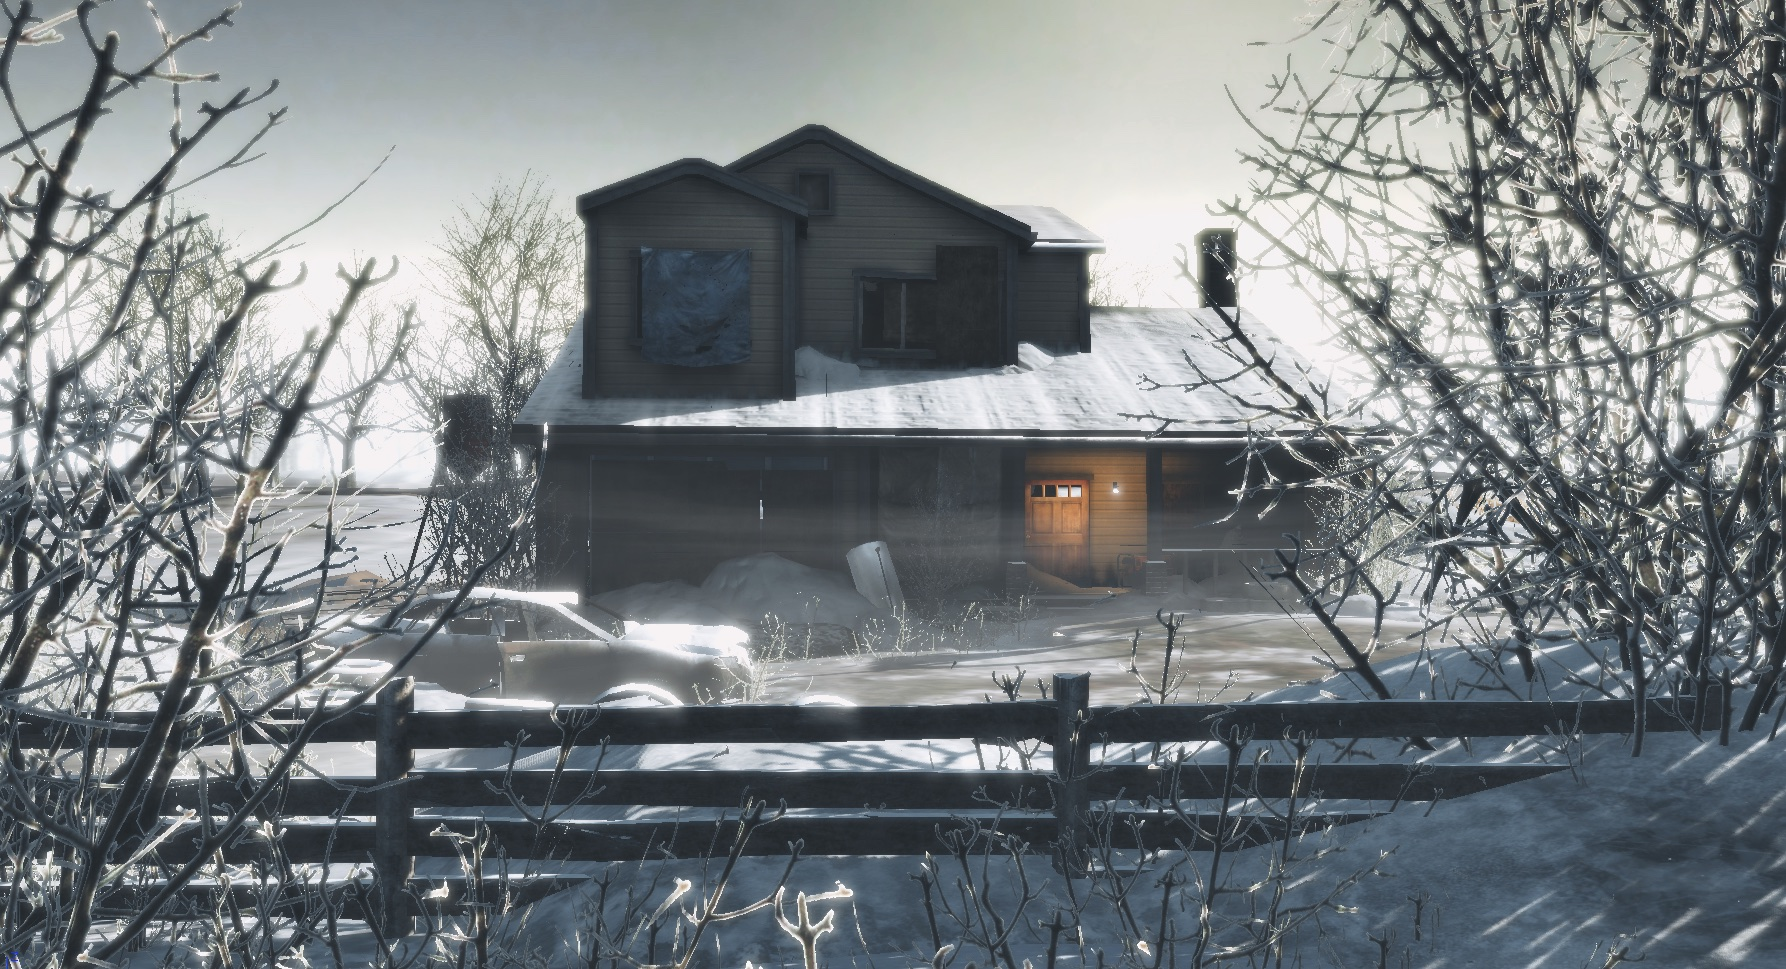 Tommy_snowFarm_01 (1).jpg